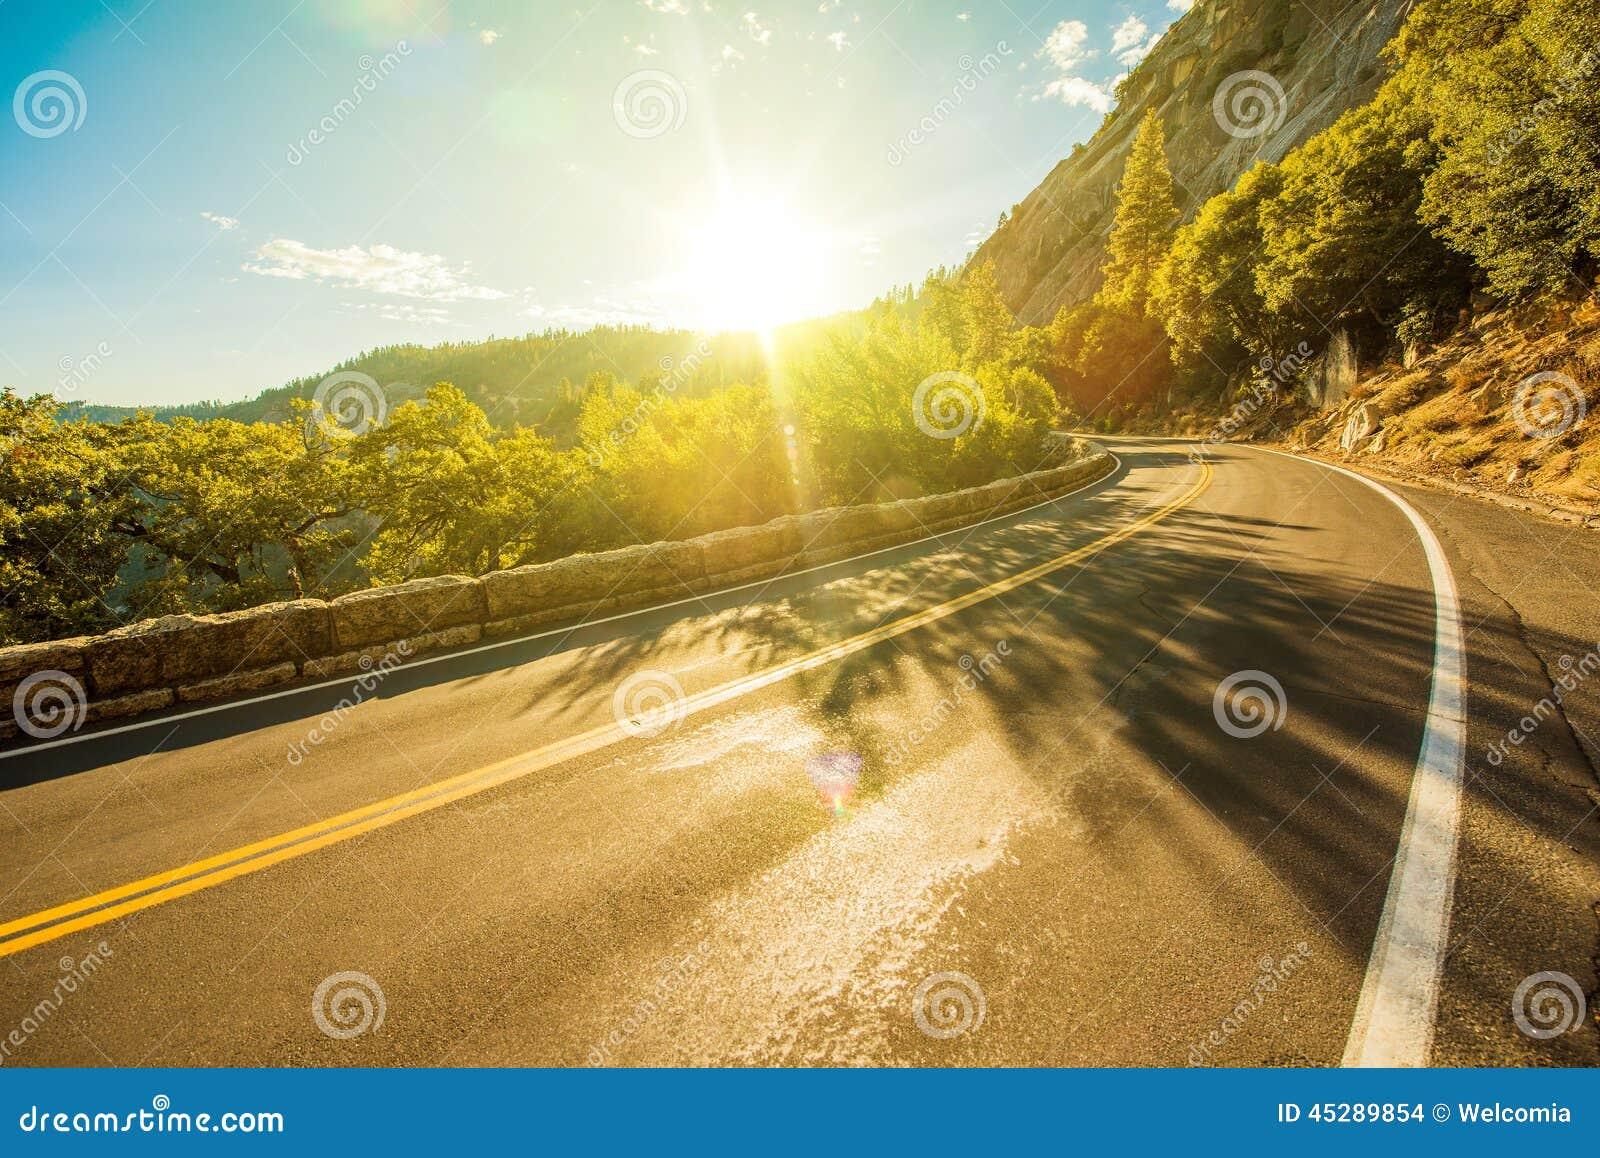 Sunny Yosemite Road